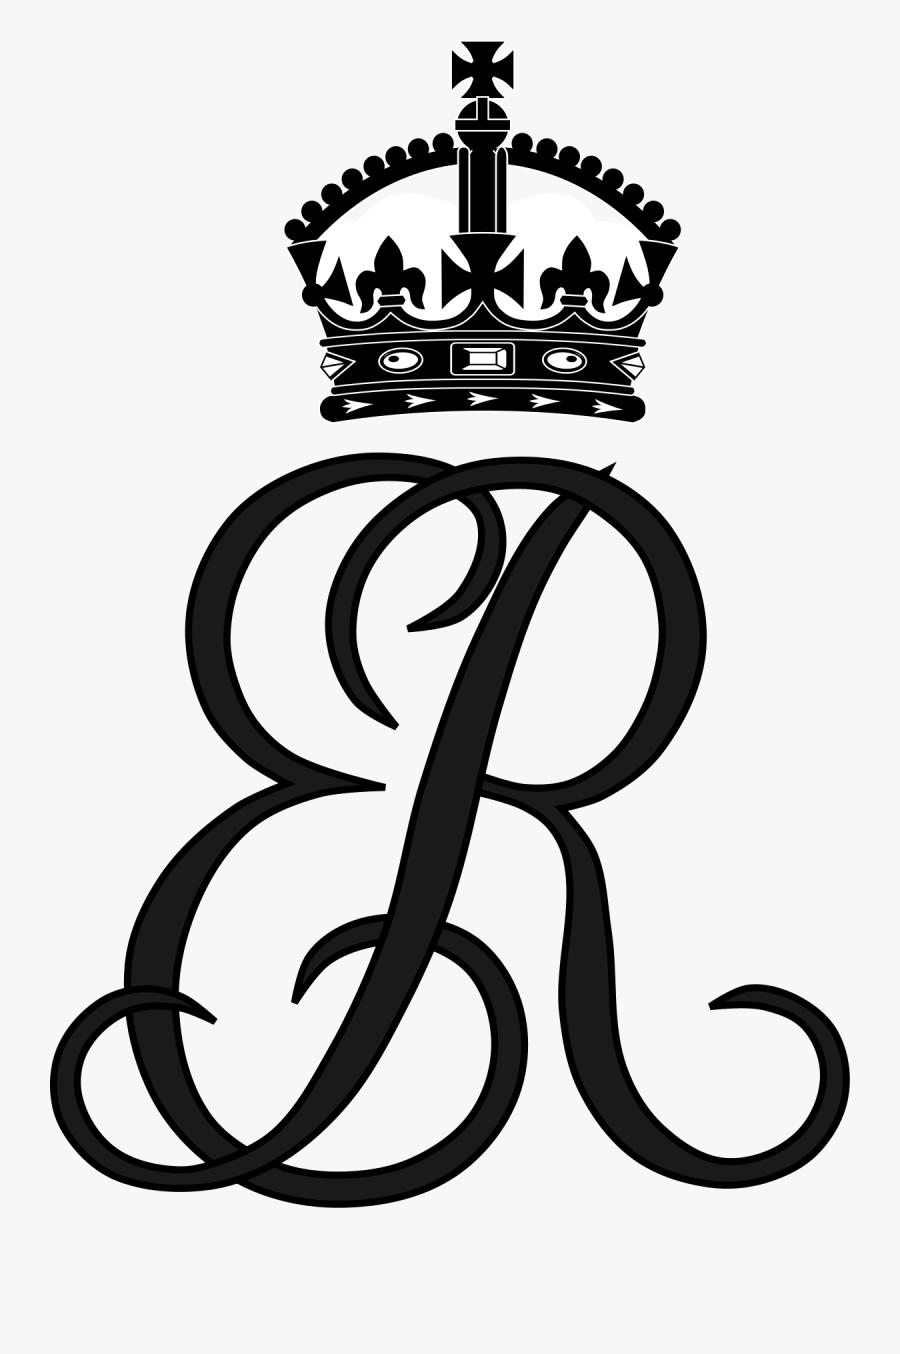 Royal Monogram Of Queen Elizabeth The Queen Mother, - British Royal Family Monograms, Transparent Clipart